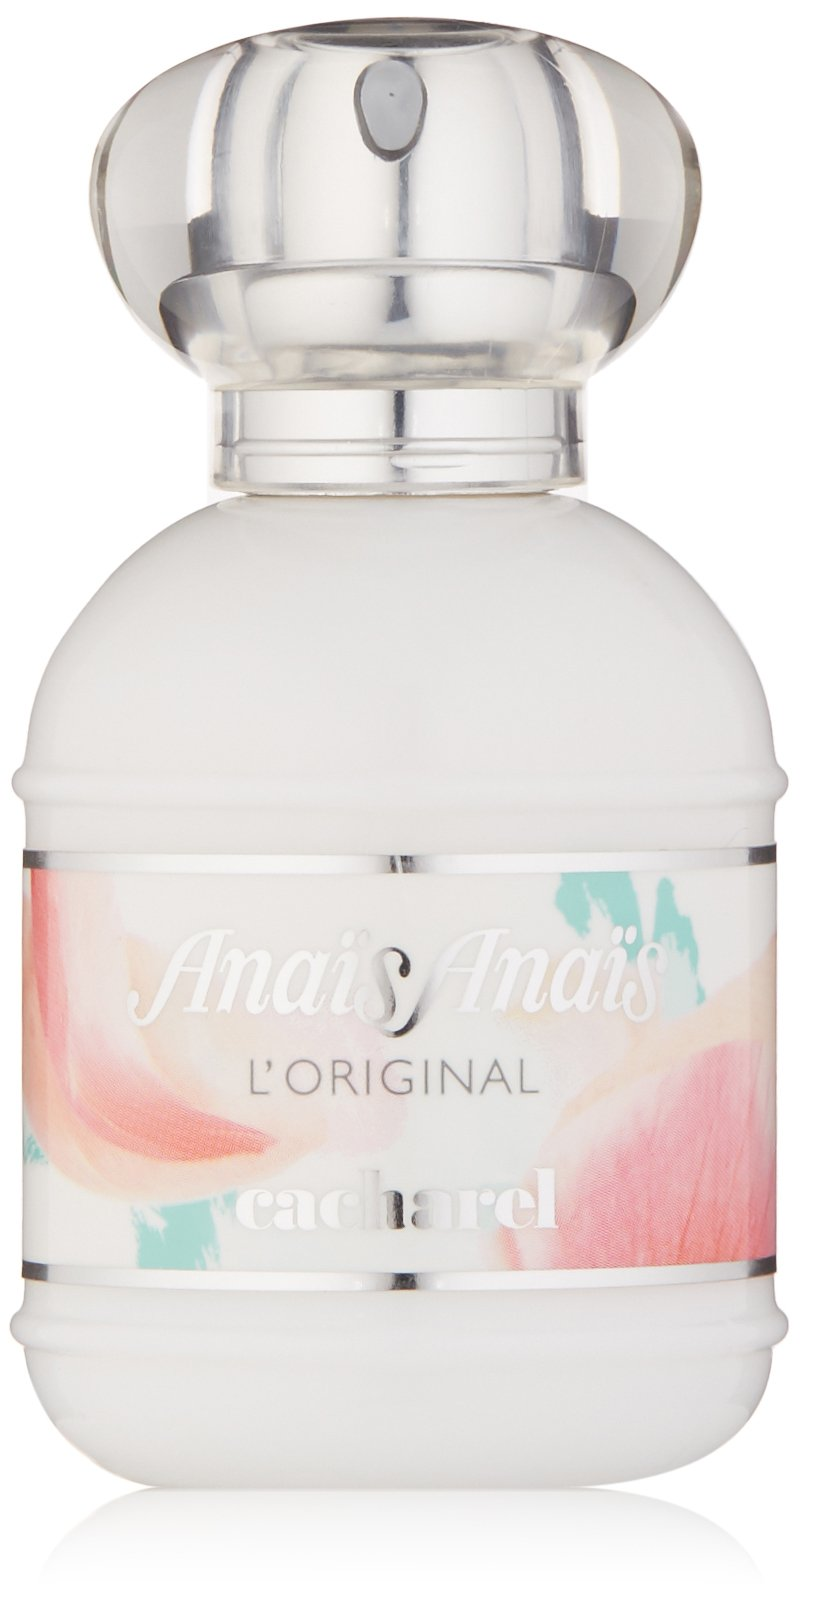 Cacharel Anais Anais Eau de Toilette Spray, 1.0 Fl Oz by Anais Anais